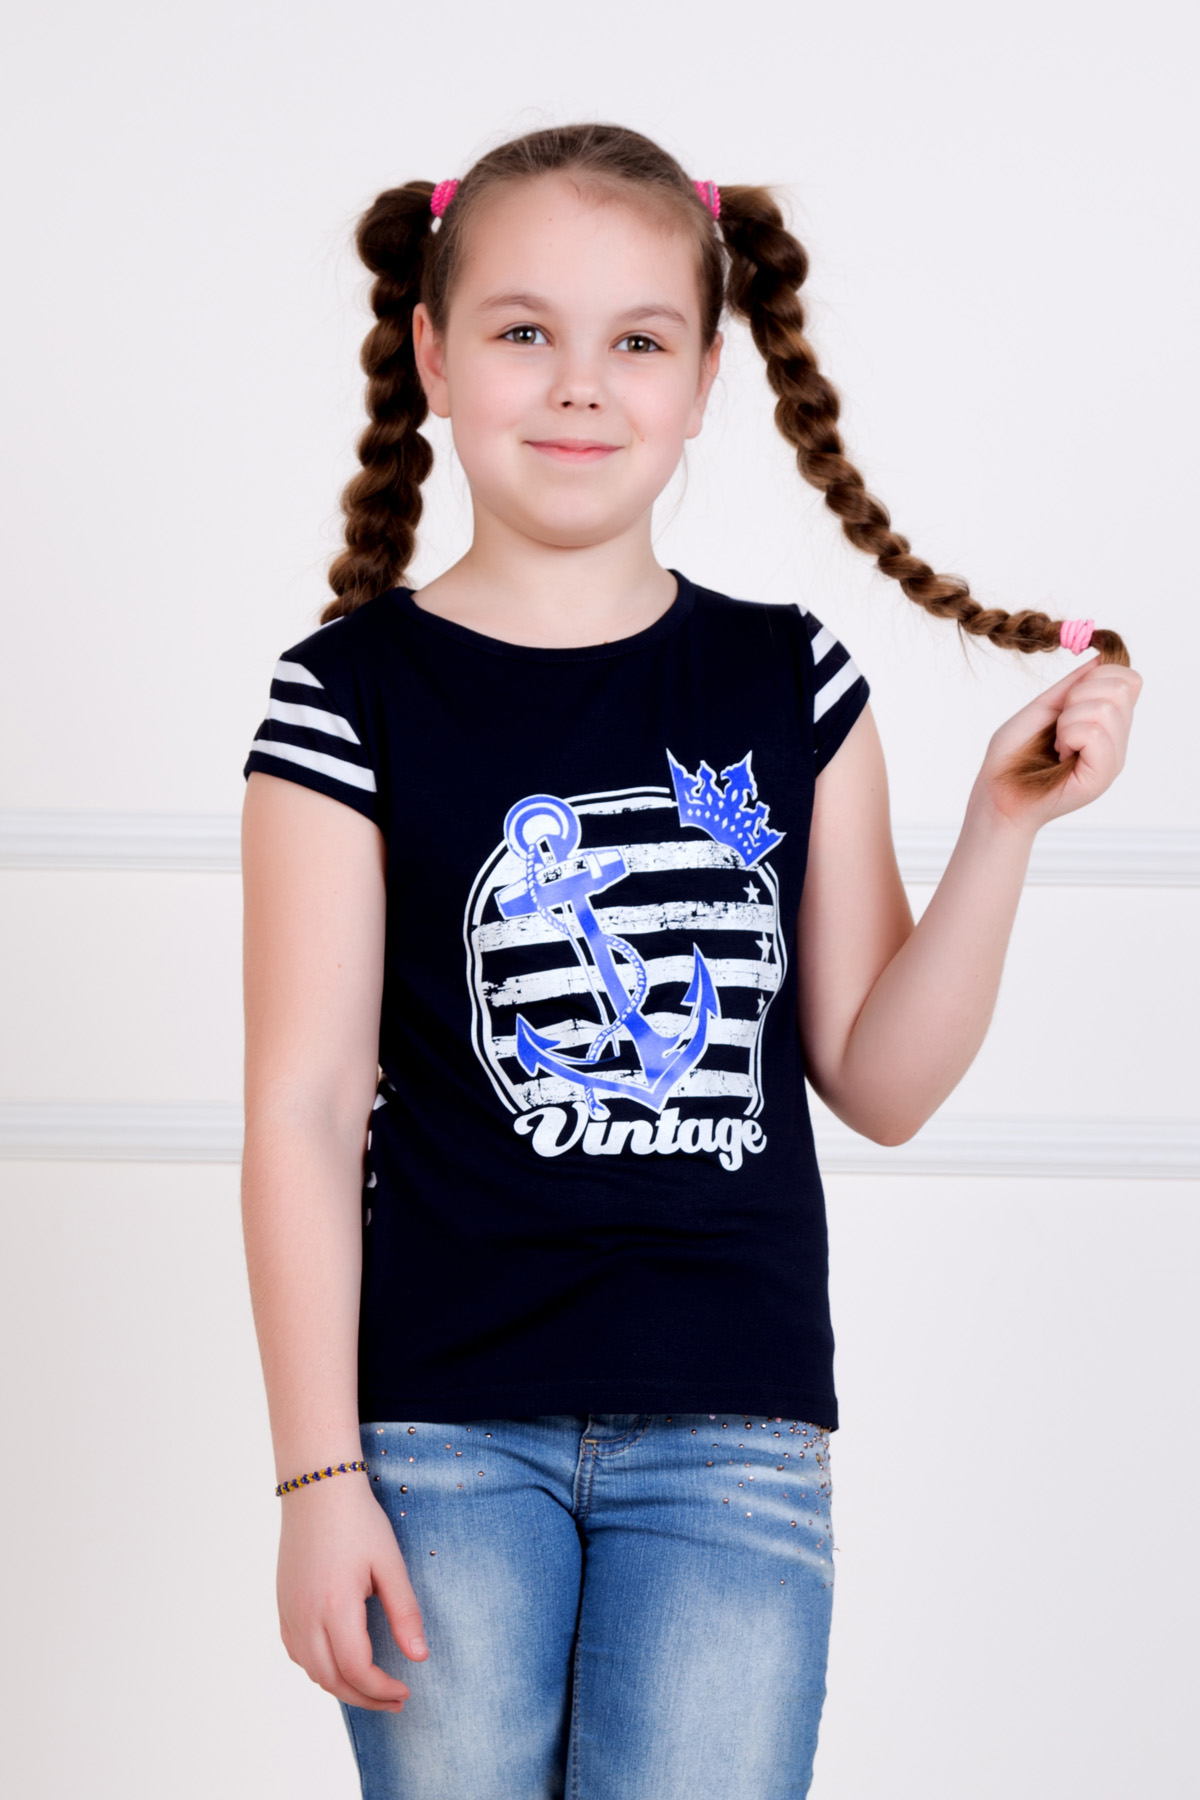 Дет. футболка Якорек р. 28Футболки и майки<br><br><br>Тип: Дет. футболка<br>Размер: 28<br>Материал: Вискоза